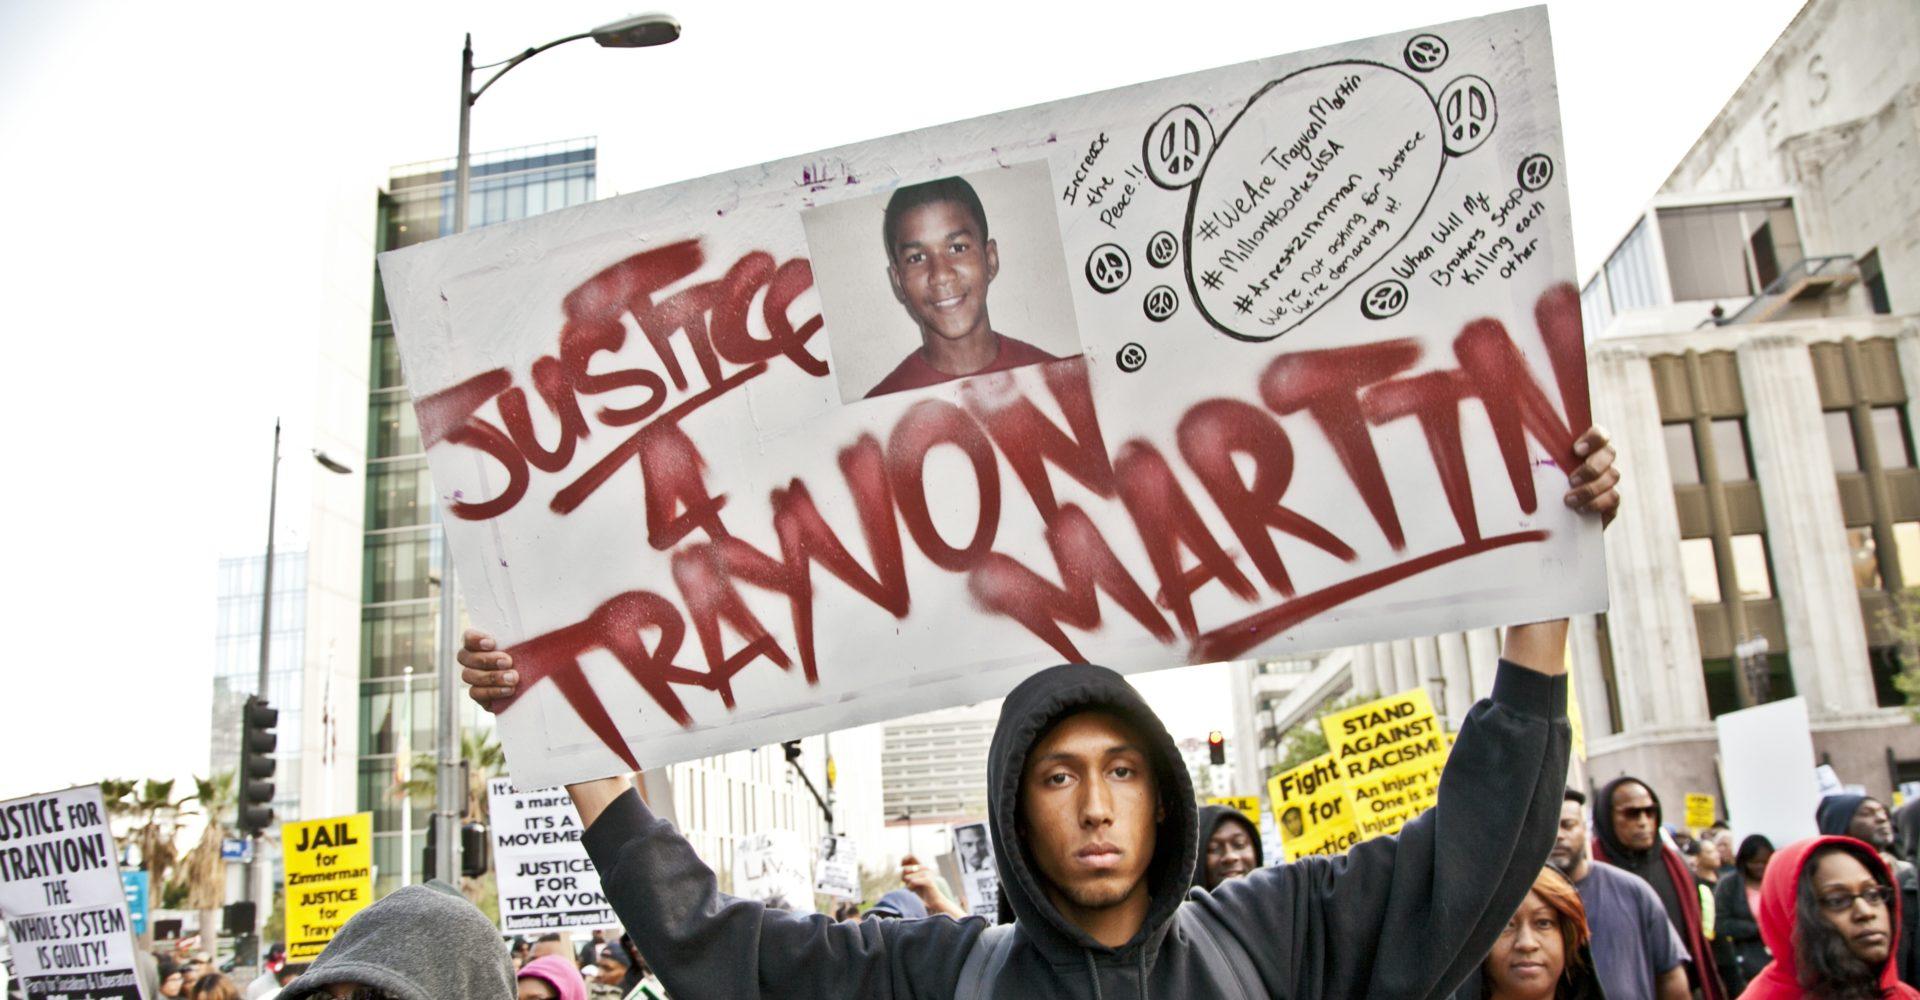 Daily Bulletin: Trayvon Martin's Mother Is Running for Office on a Gun Reform Platform